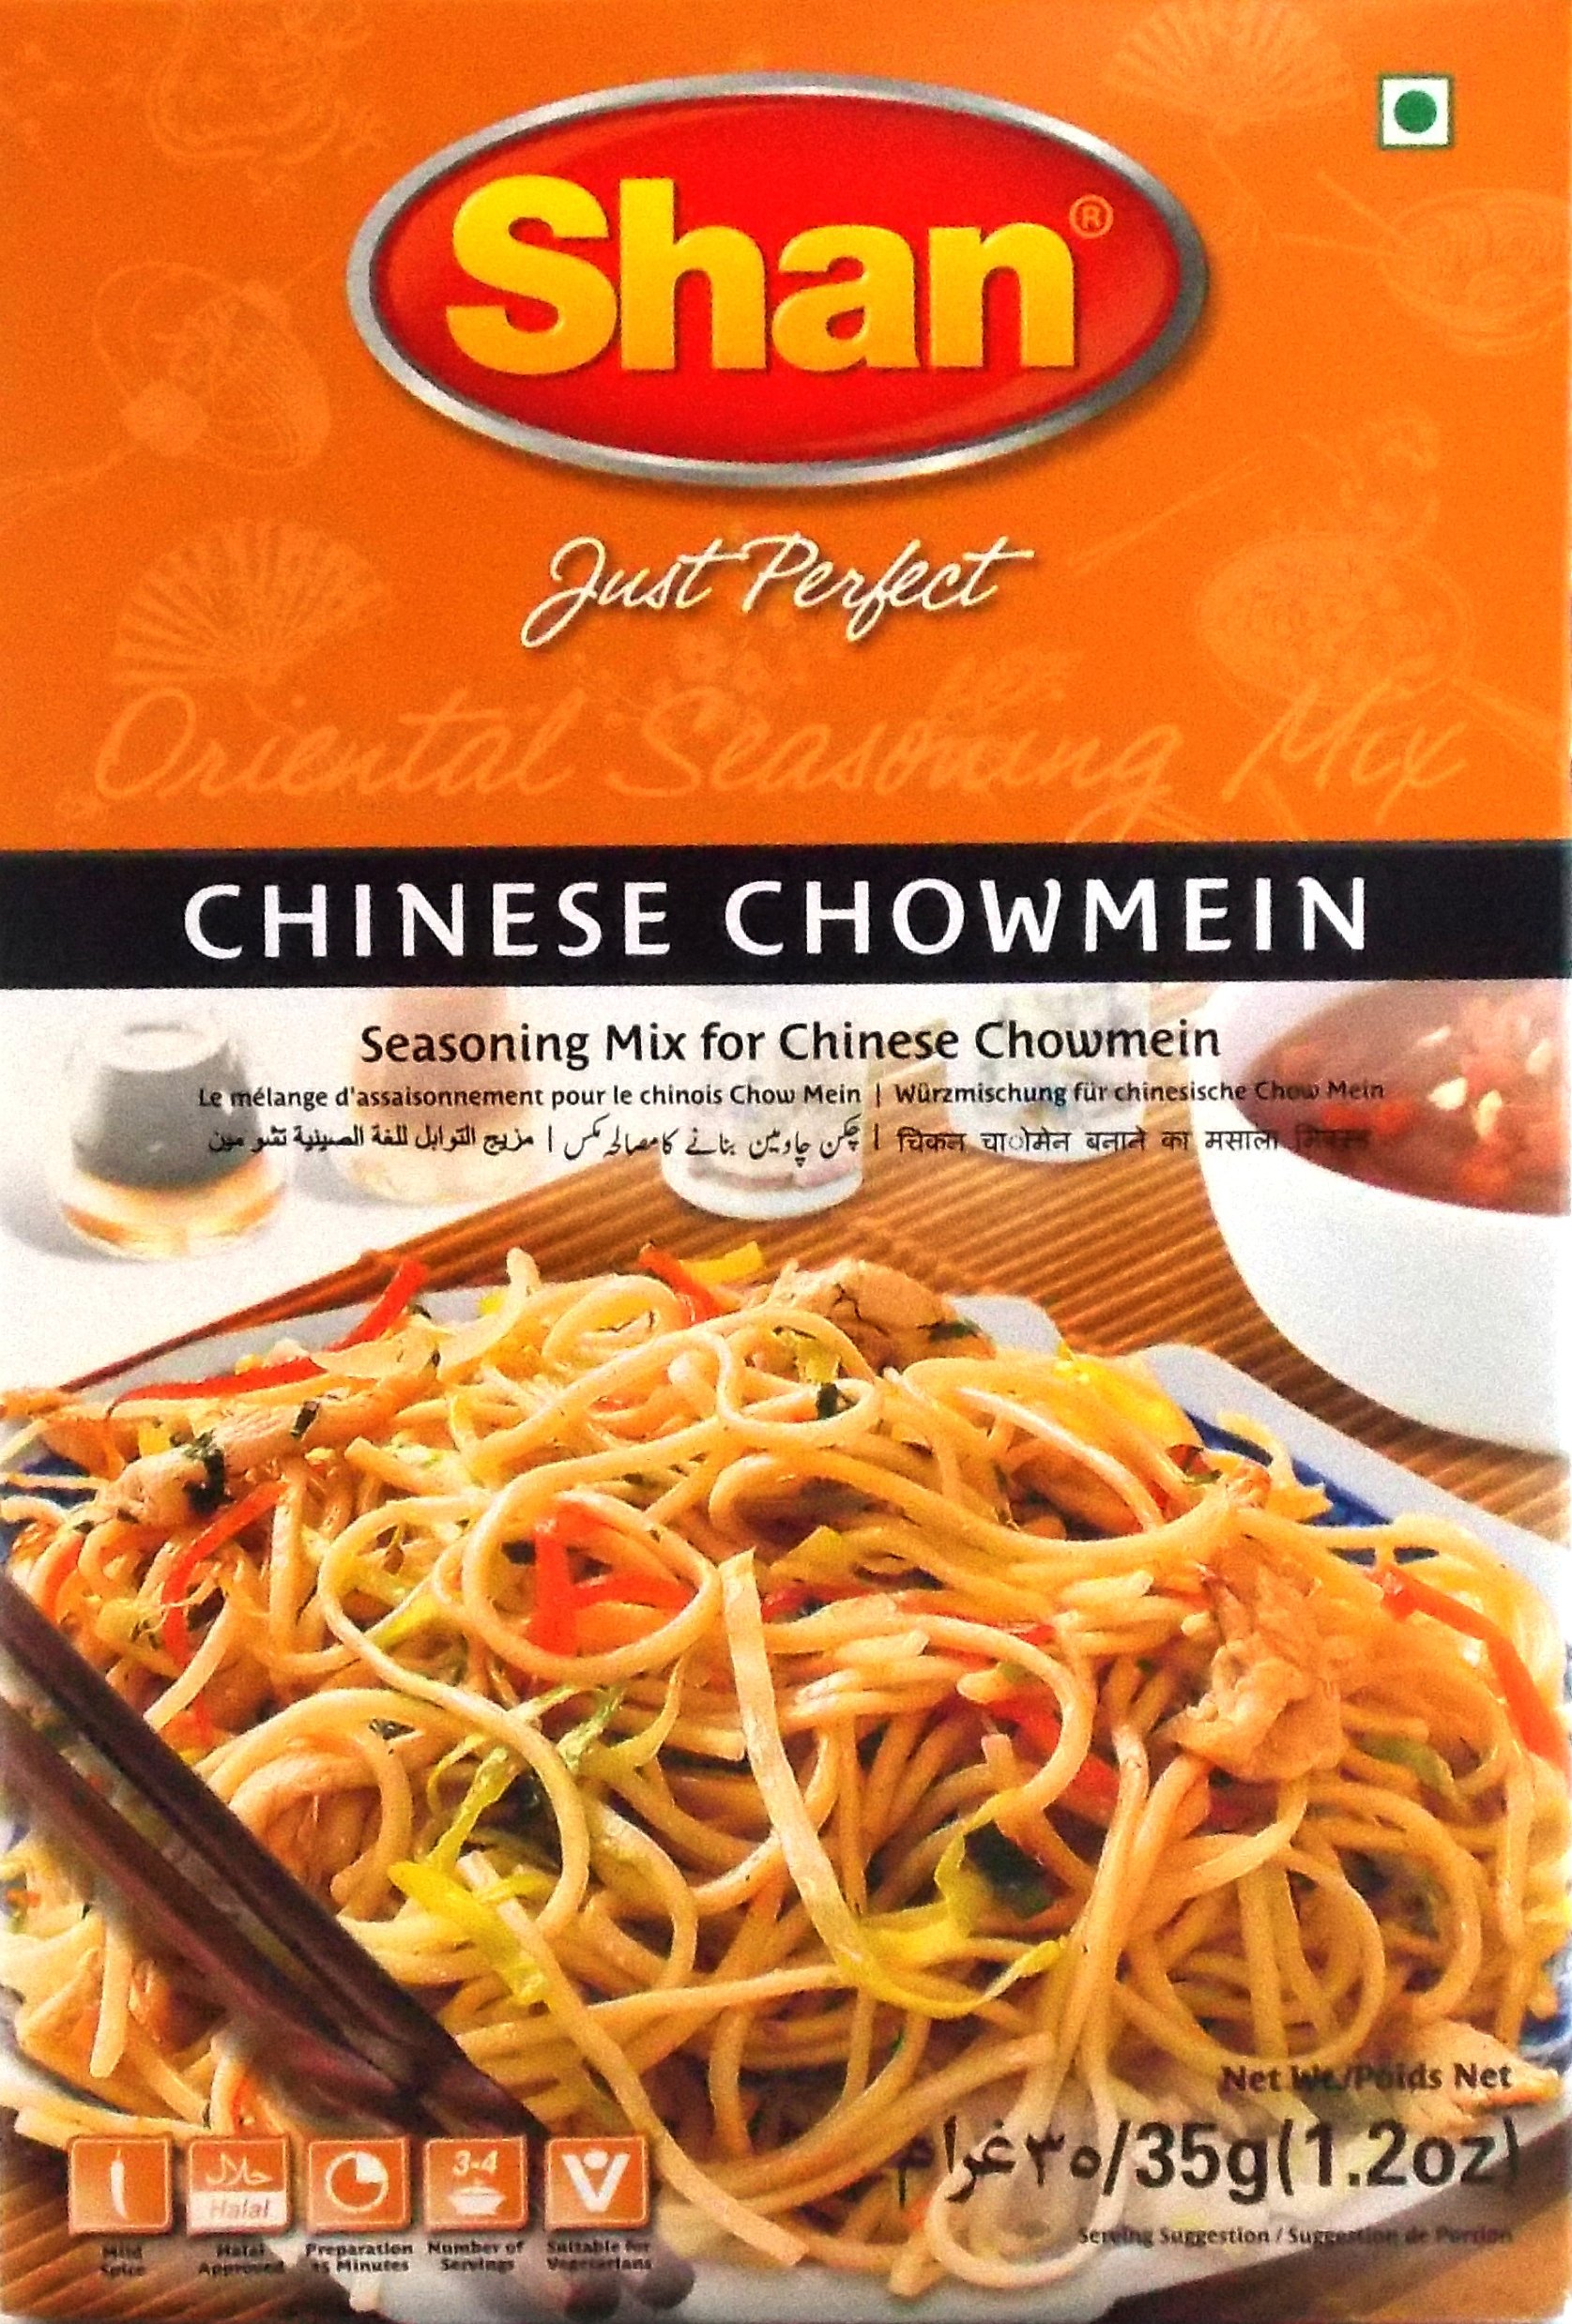 Shan Chinese Chowmein Seasoning Mix (35g) - Pack of 6